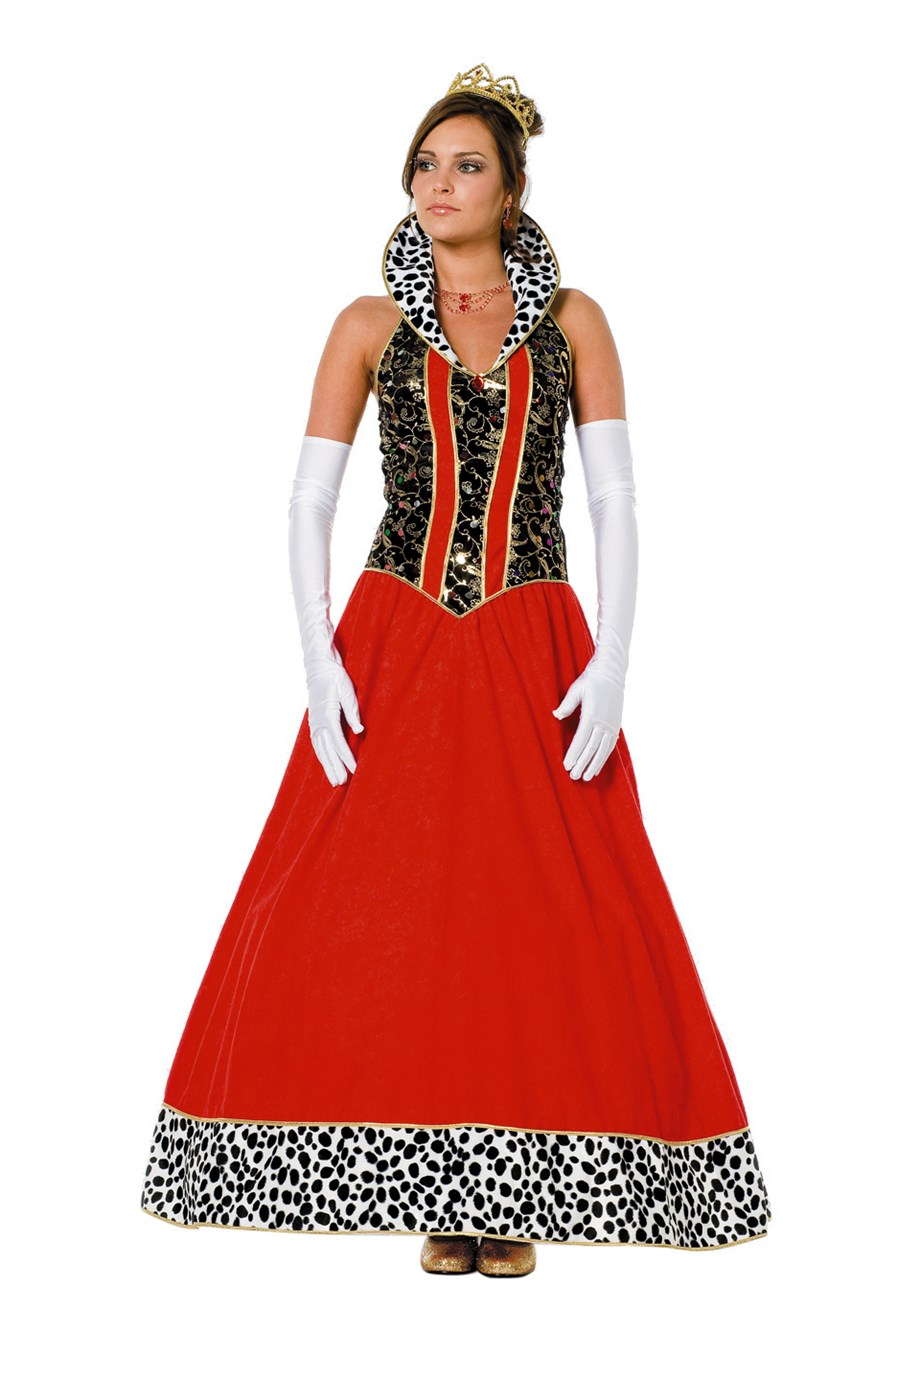 Koningin jurk lang voor dame